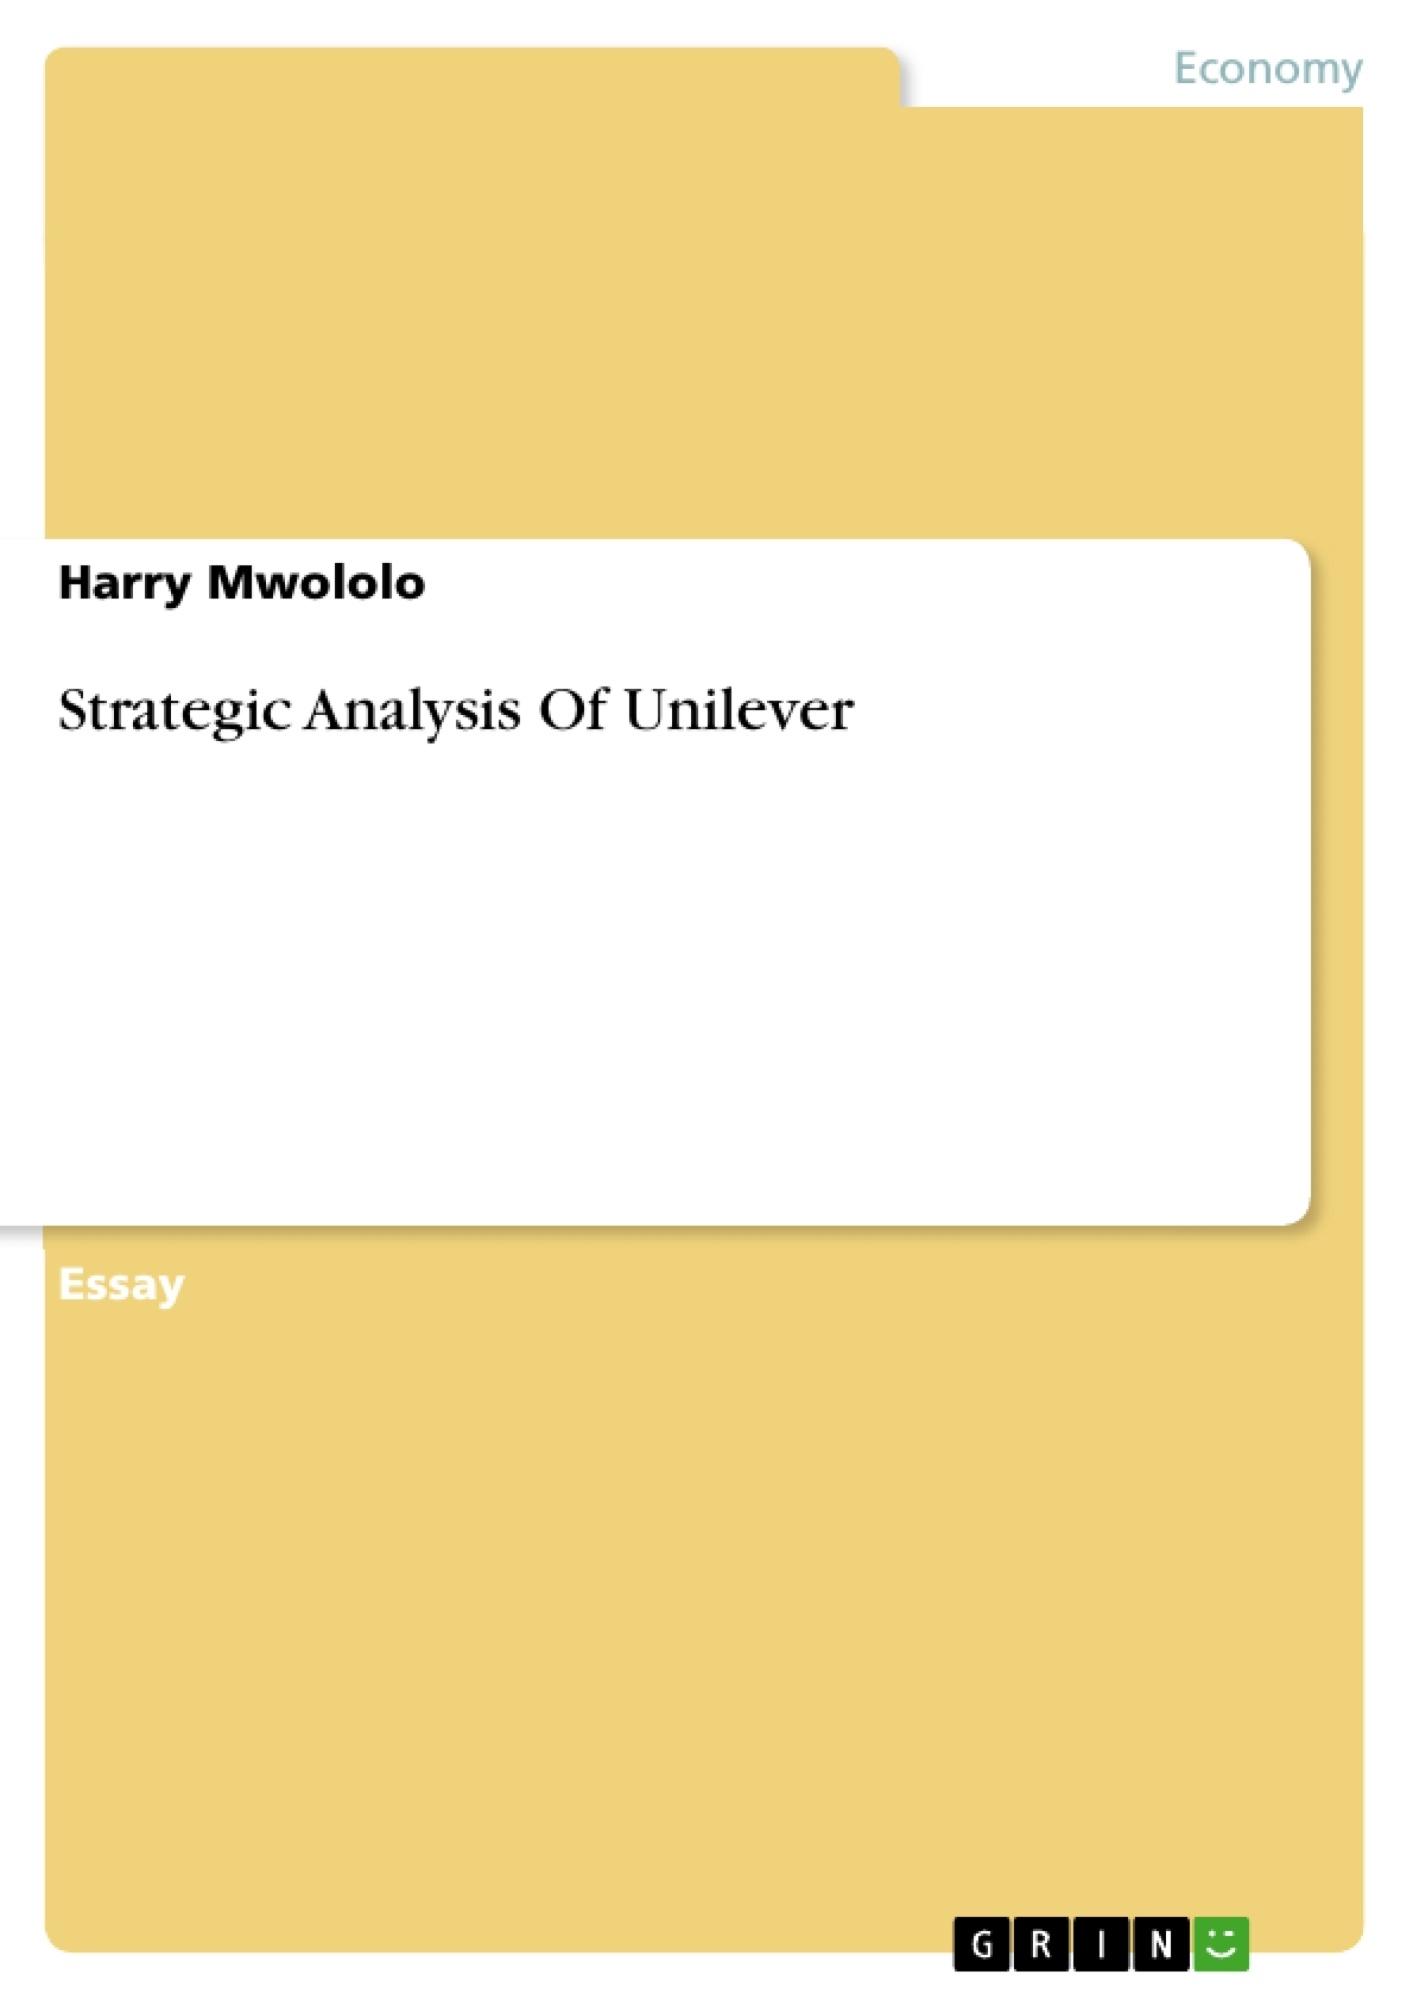 Title: Strategic Analysis Of Unilever